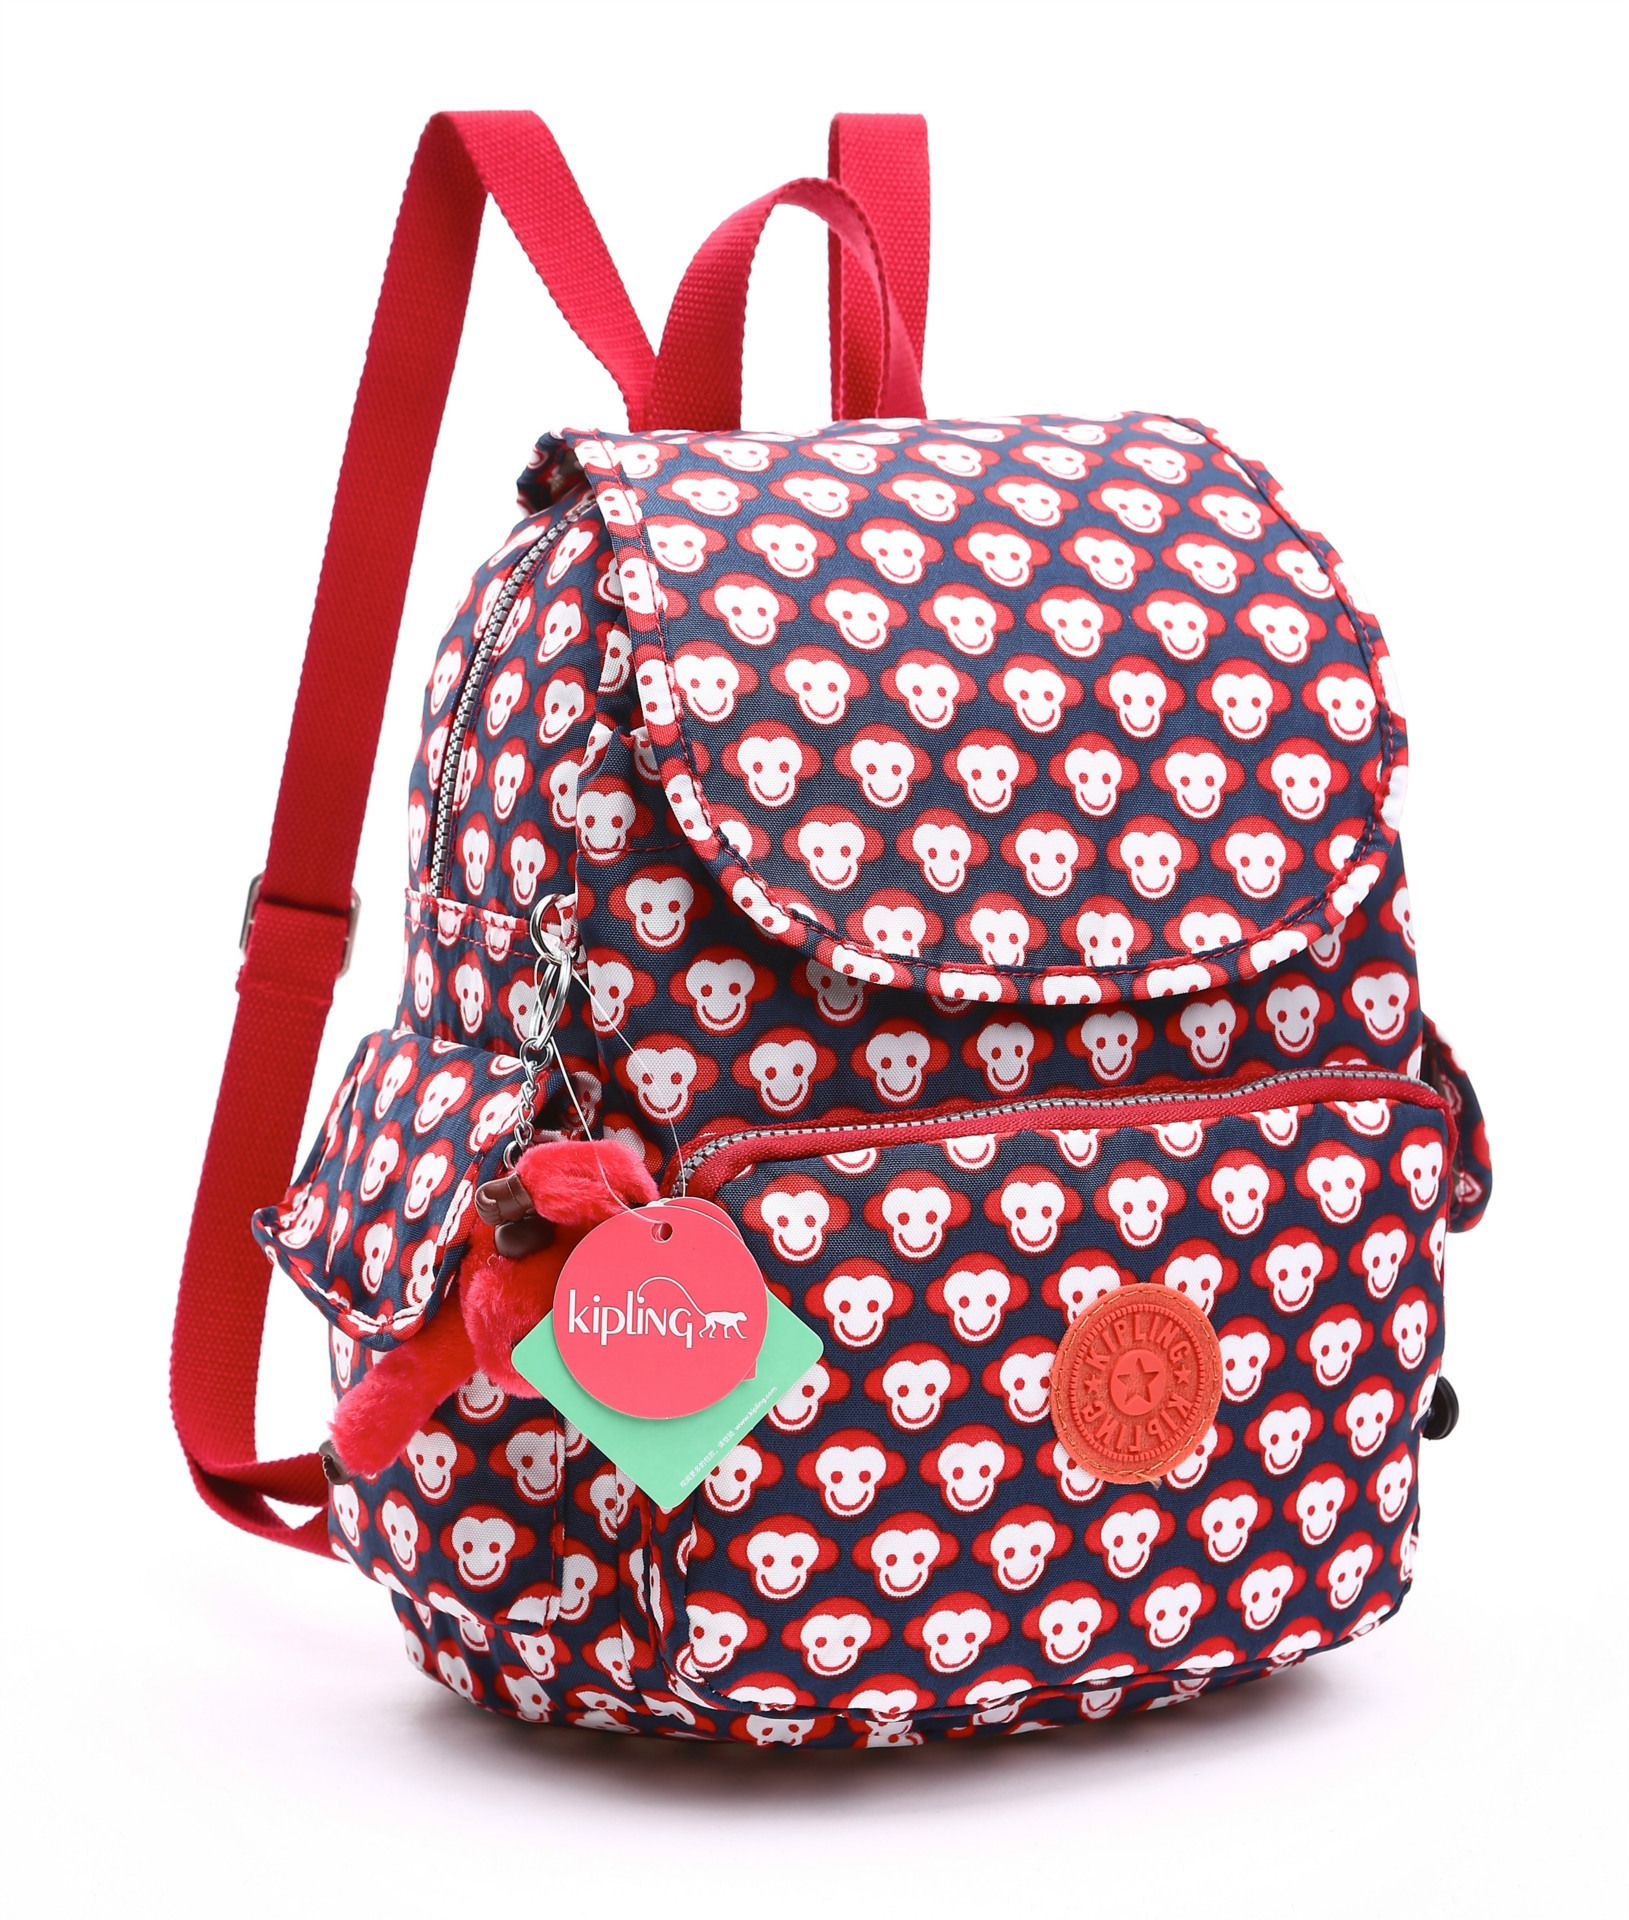 new casual women backpack canvas kipling school bags travel